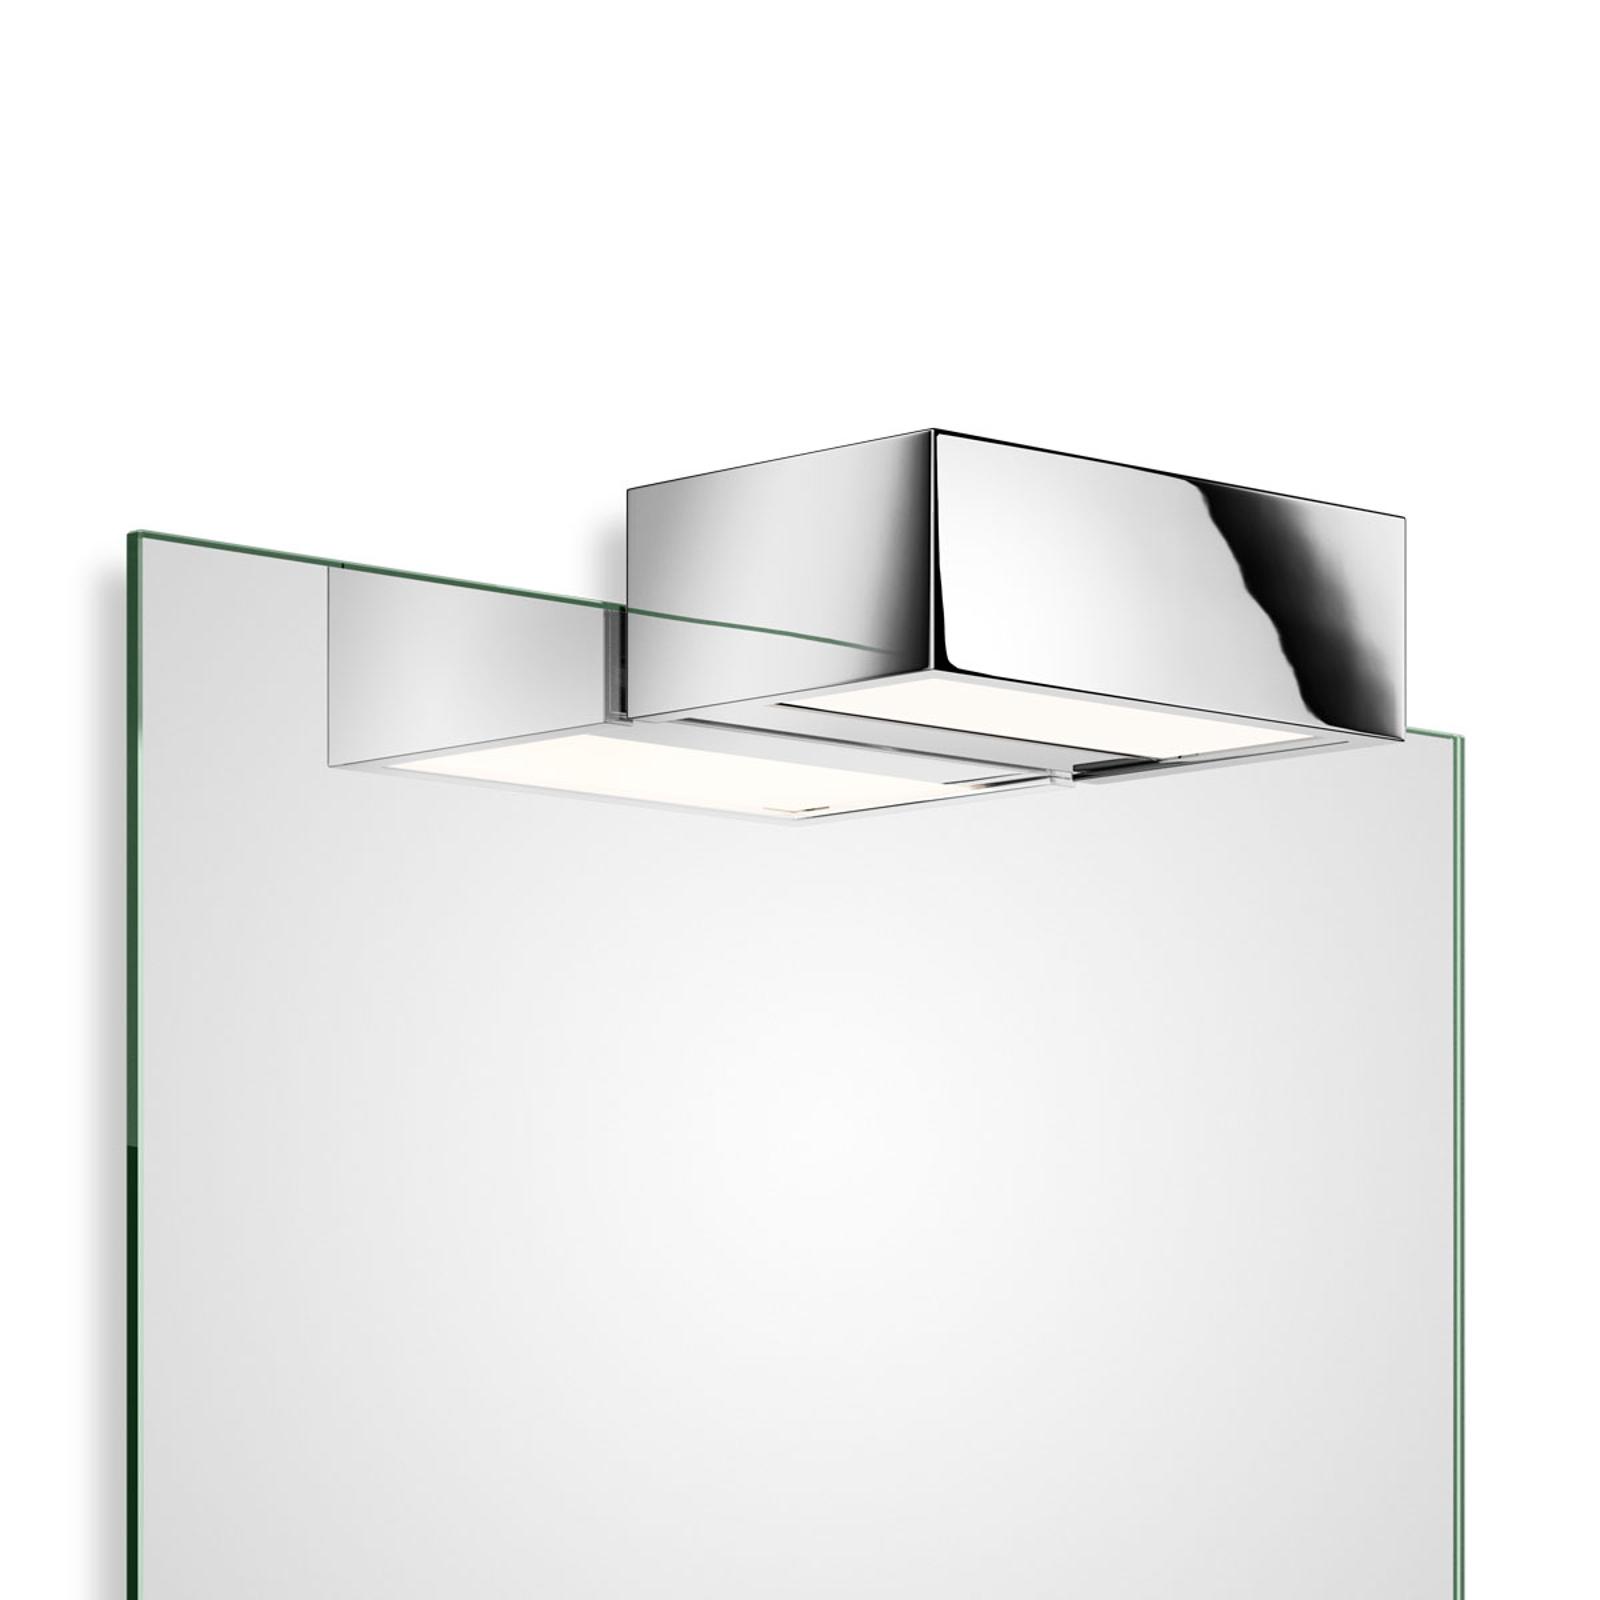 Decor Walther Box 1-15 N applique miroir LED 3000K